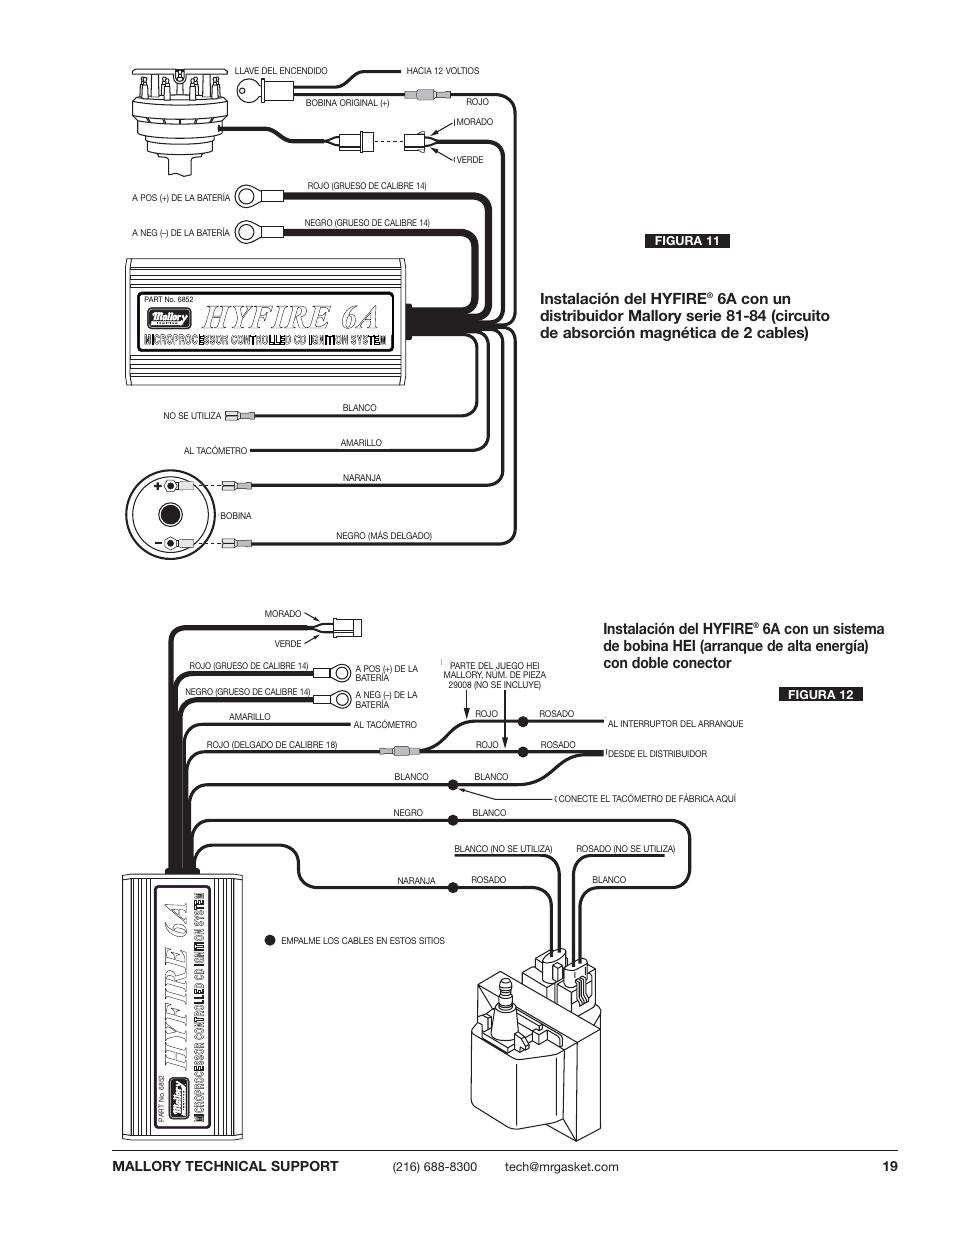 Msd 6al 6420 1978 Ford Wiring Diagram Auto Electrical Flamethrower